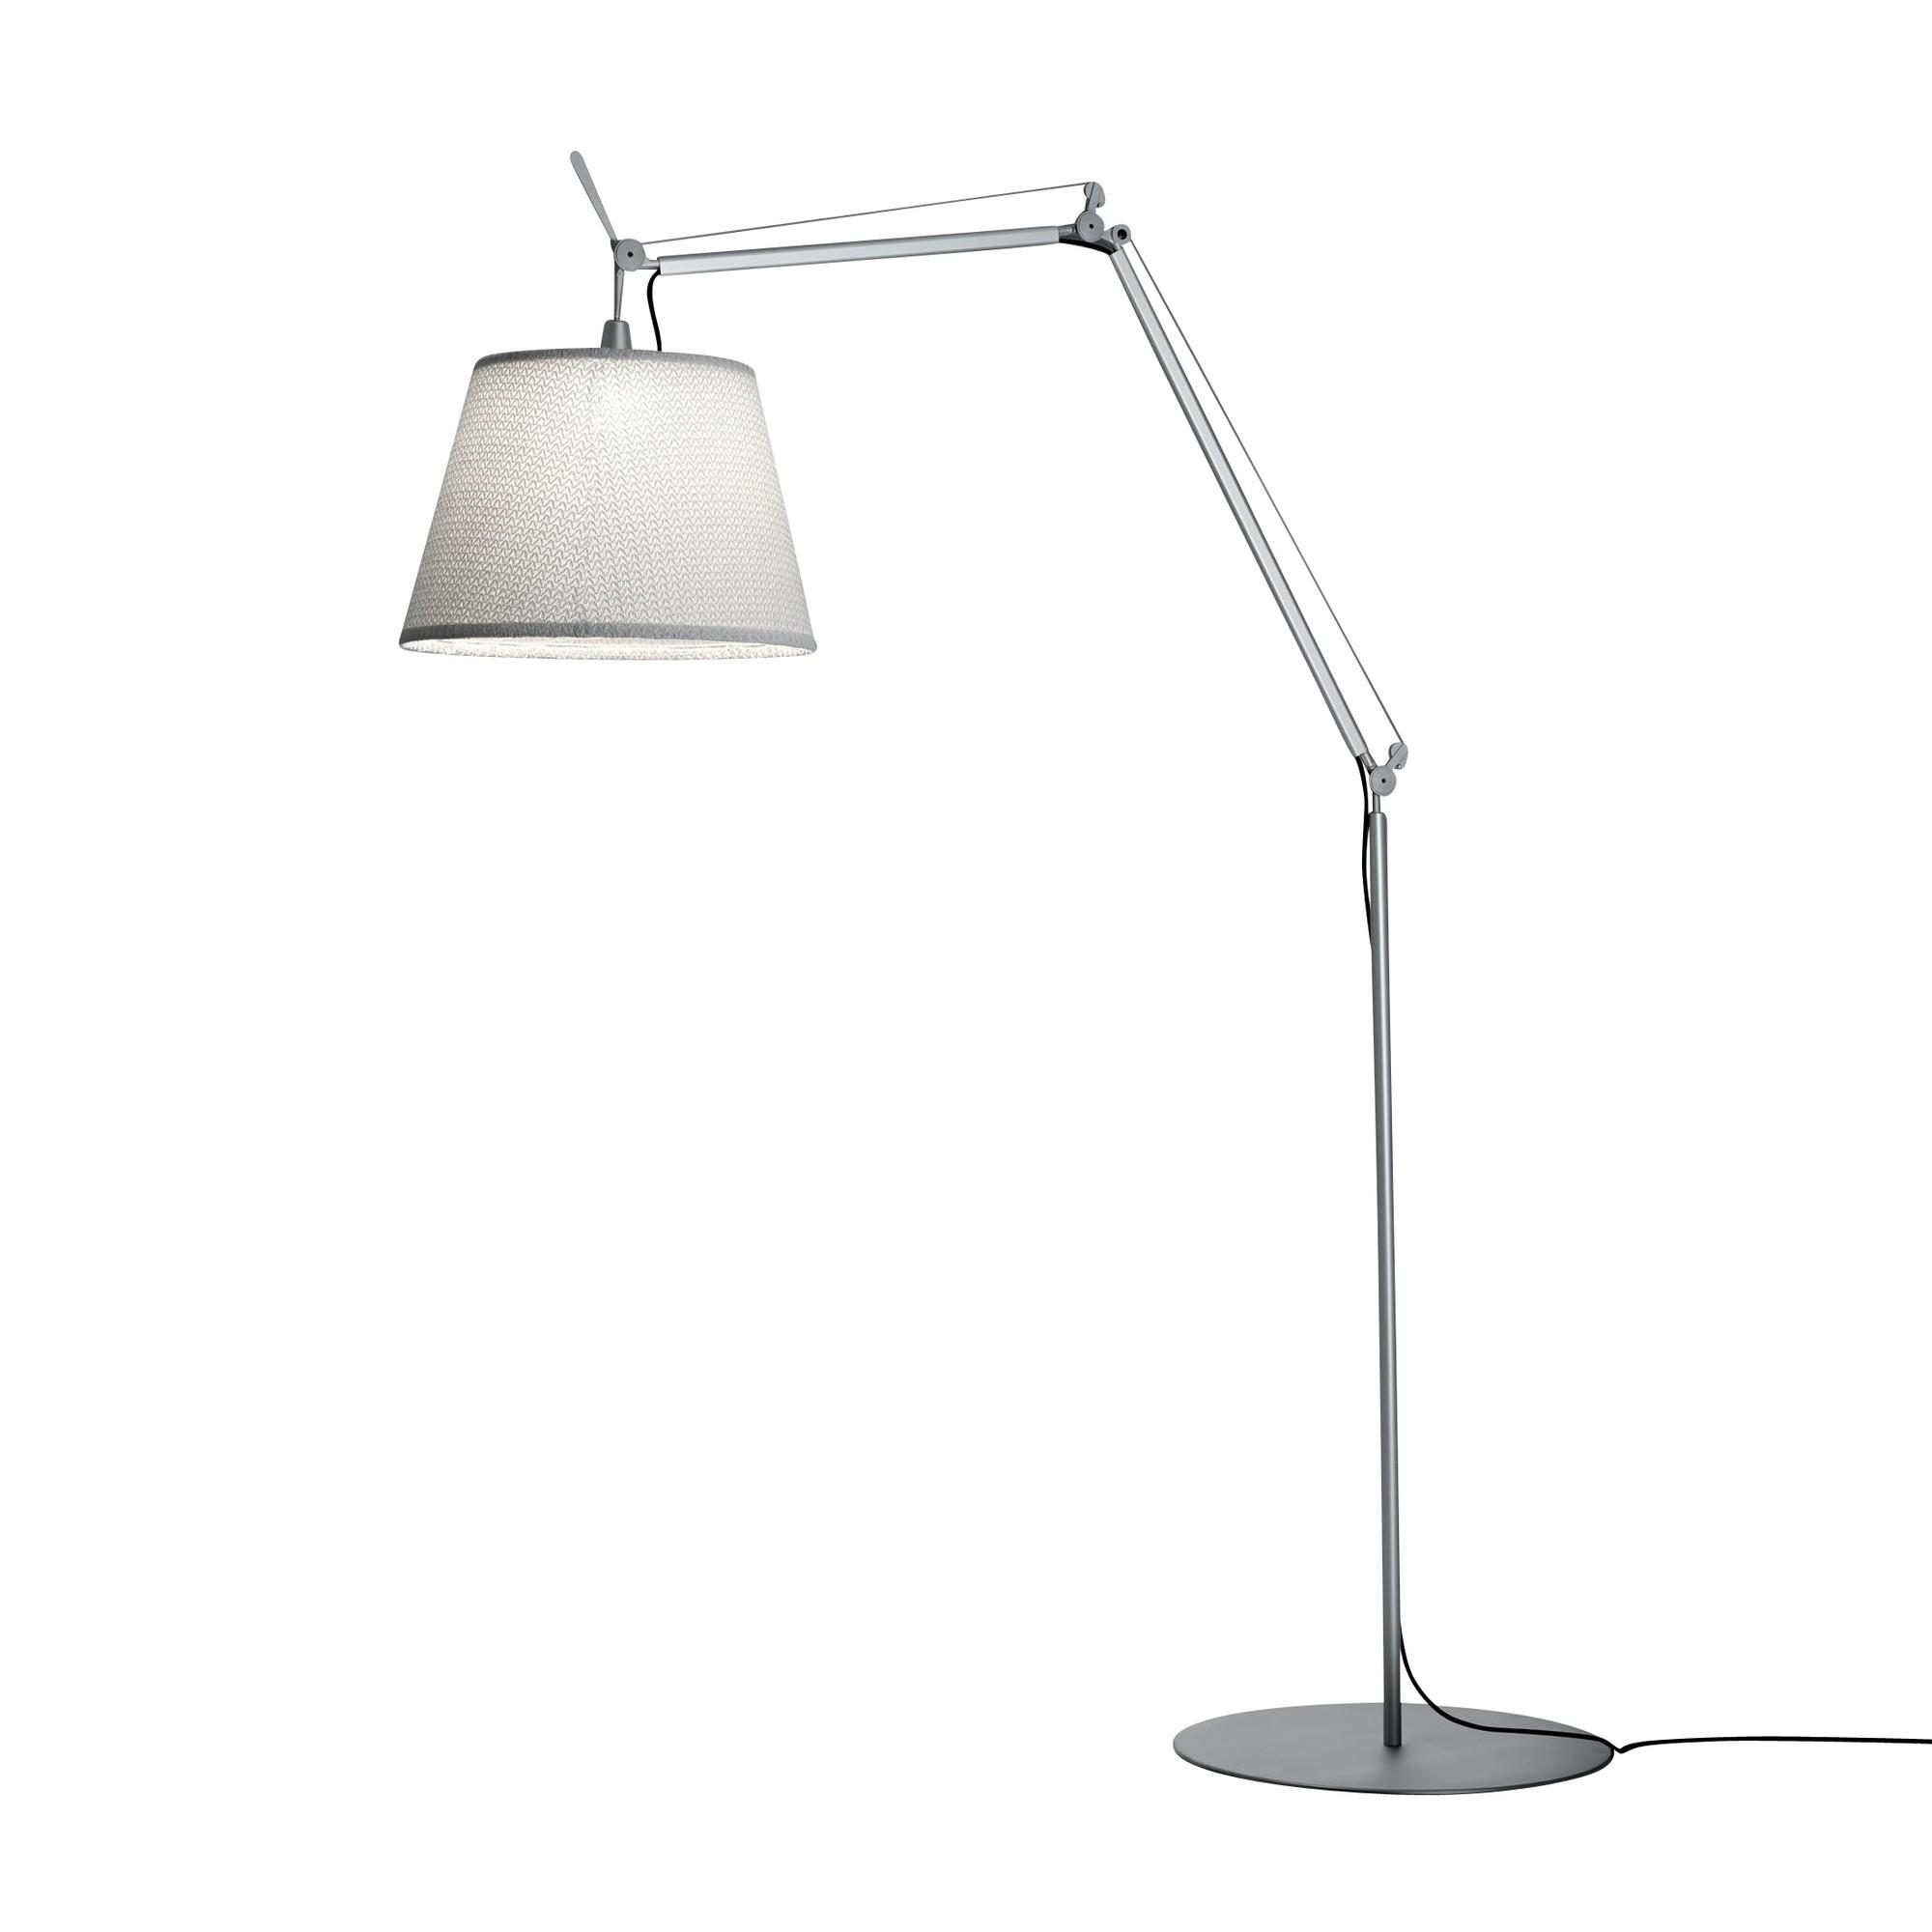 Artemide Tolomeo Paralume Led Outdoor Floor Lamp Ambientedirect